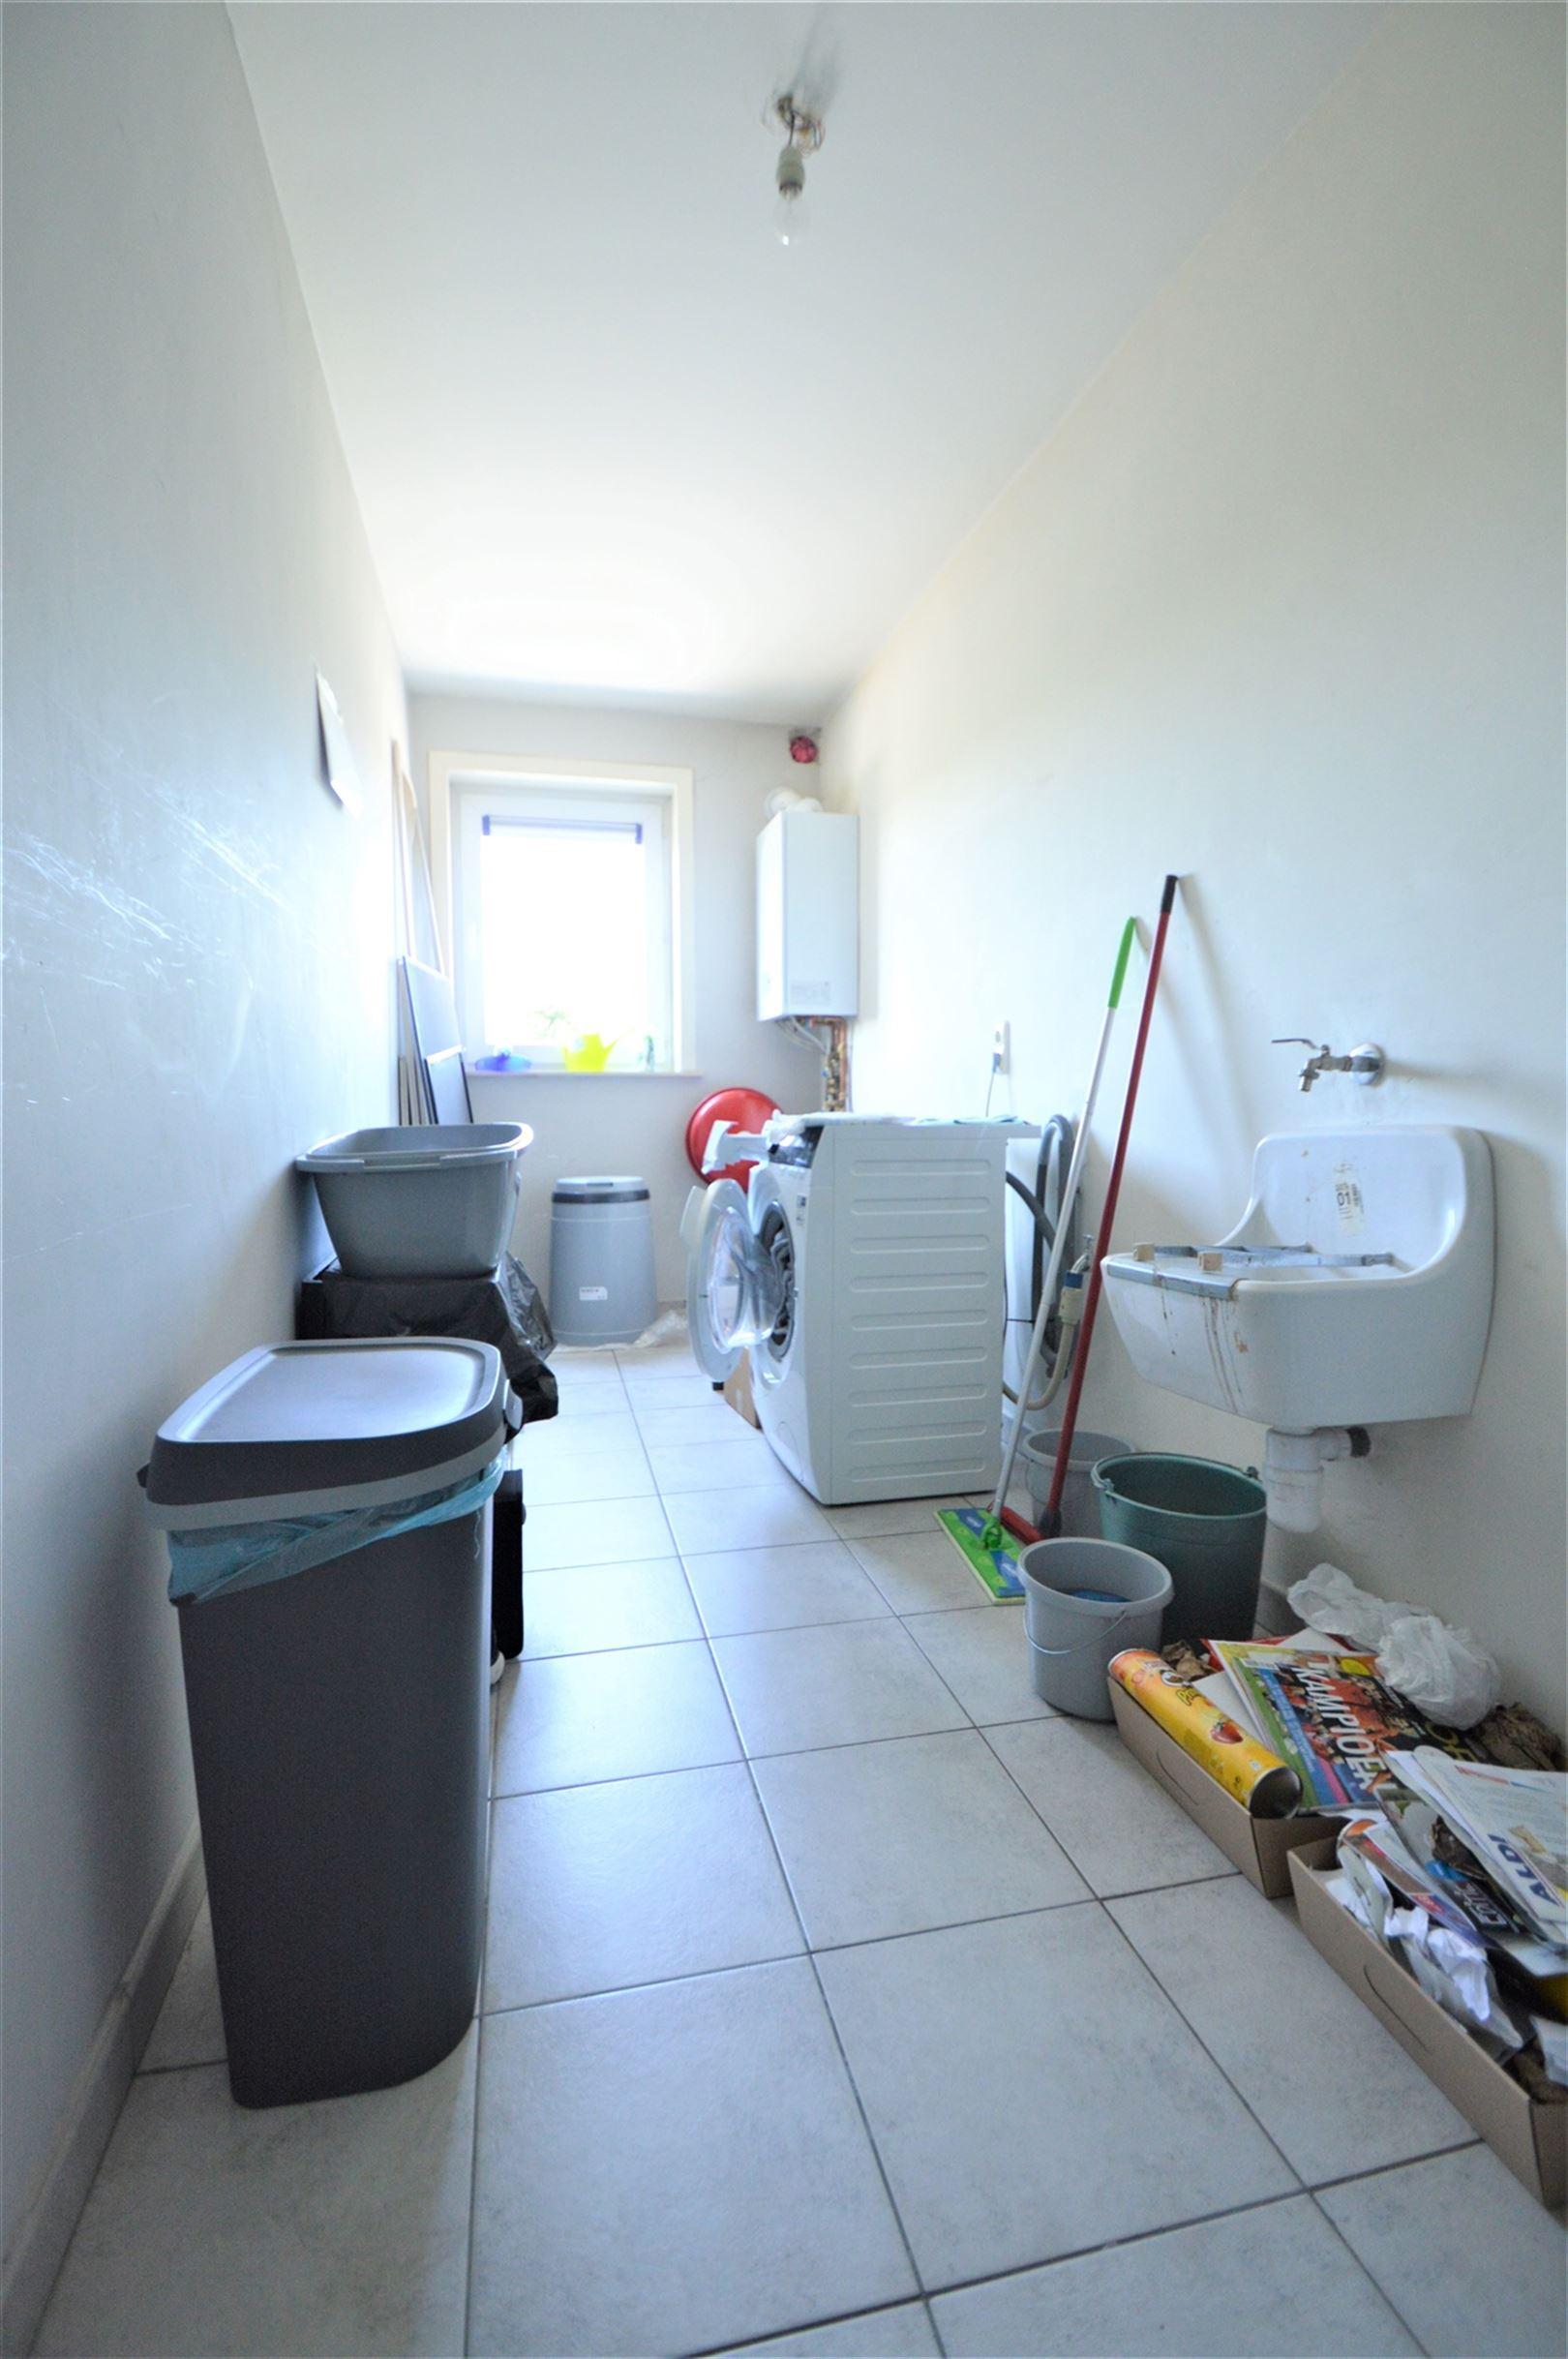 Foto 6 : Appartement te 9200 Baasrode (België) - Prijs € 630